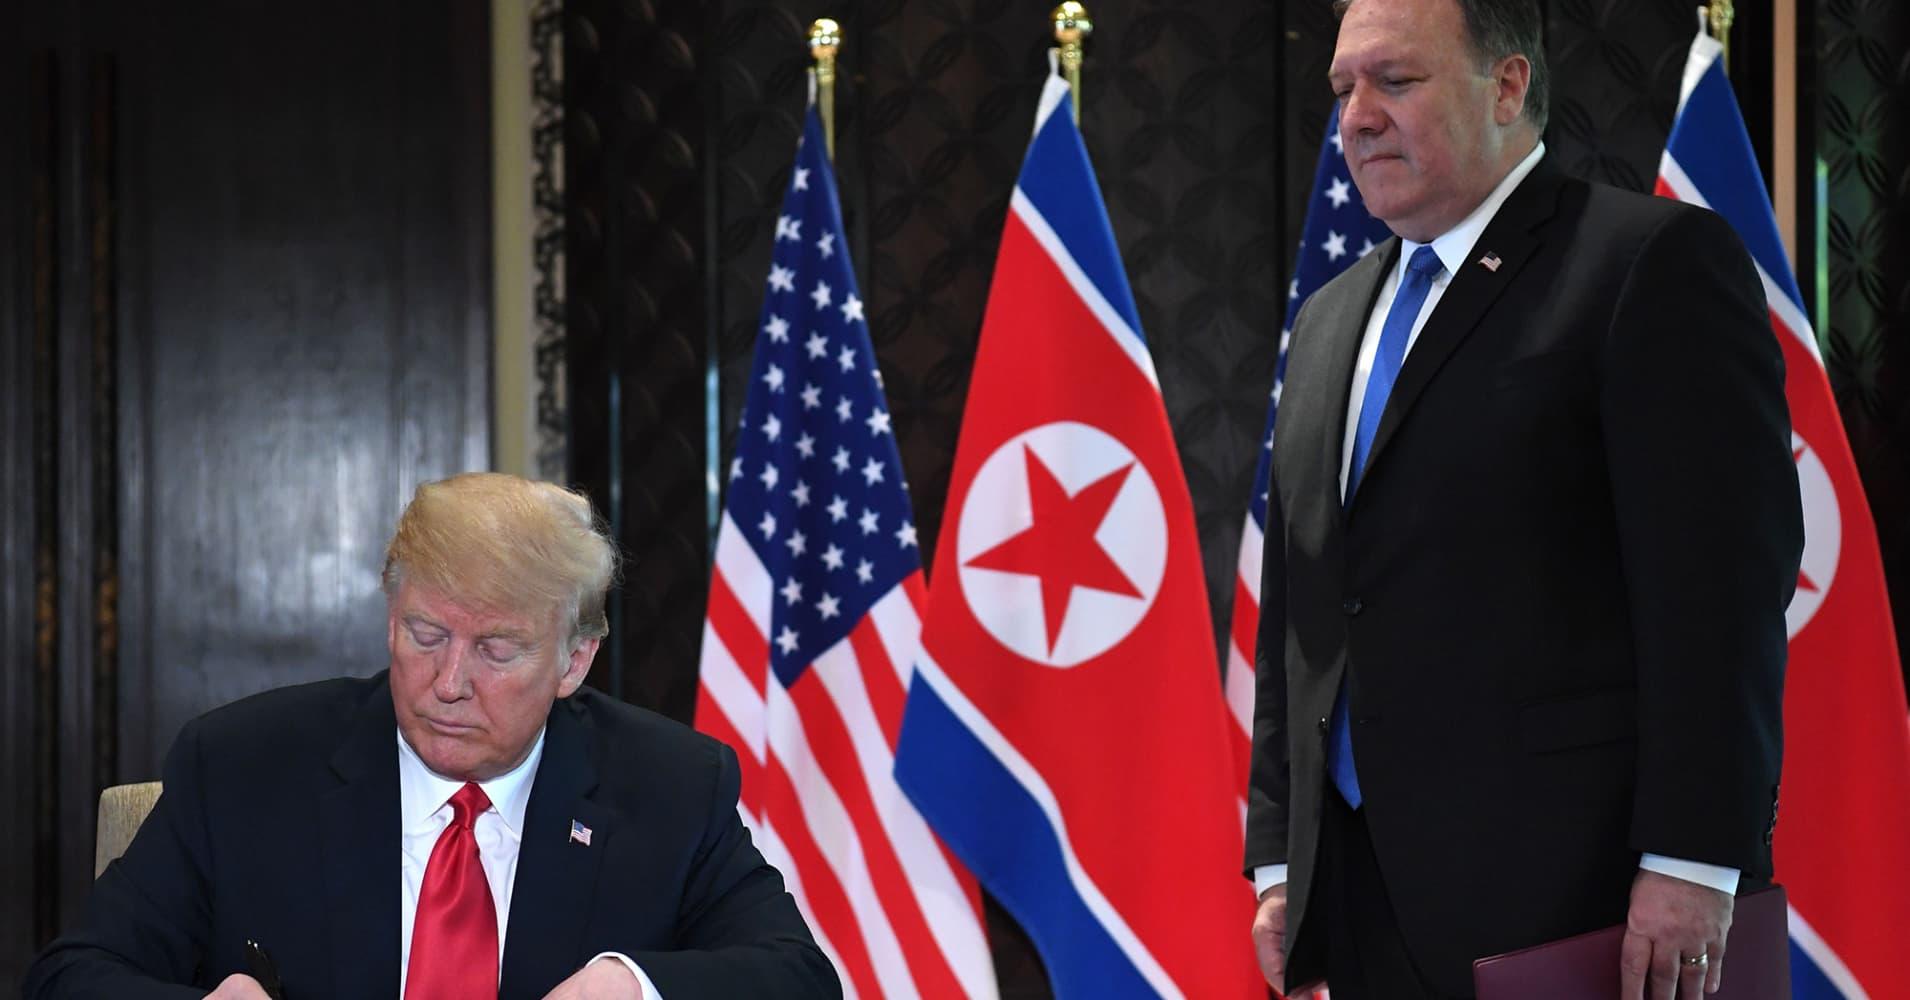 US-South Korea military exercises would resume if North Korea stops good-faith talks, Pompeo says